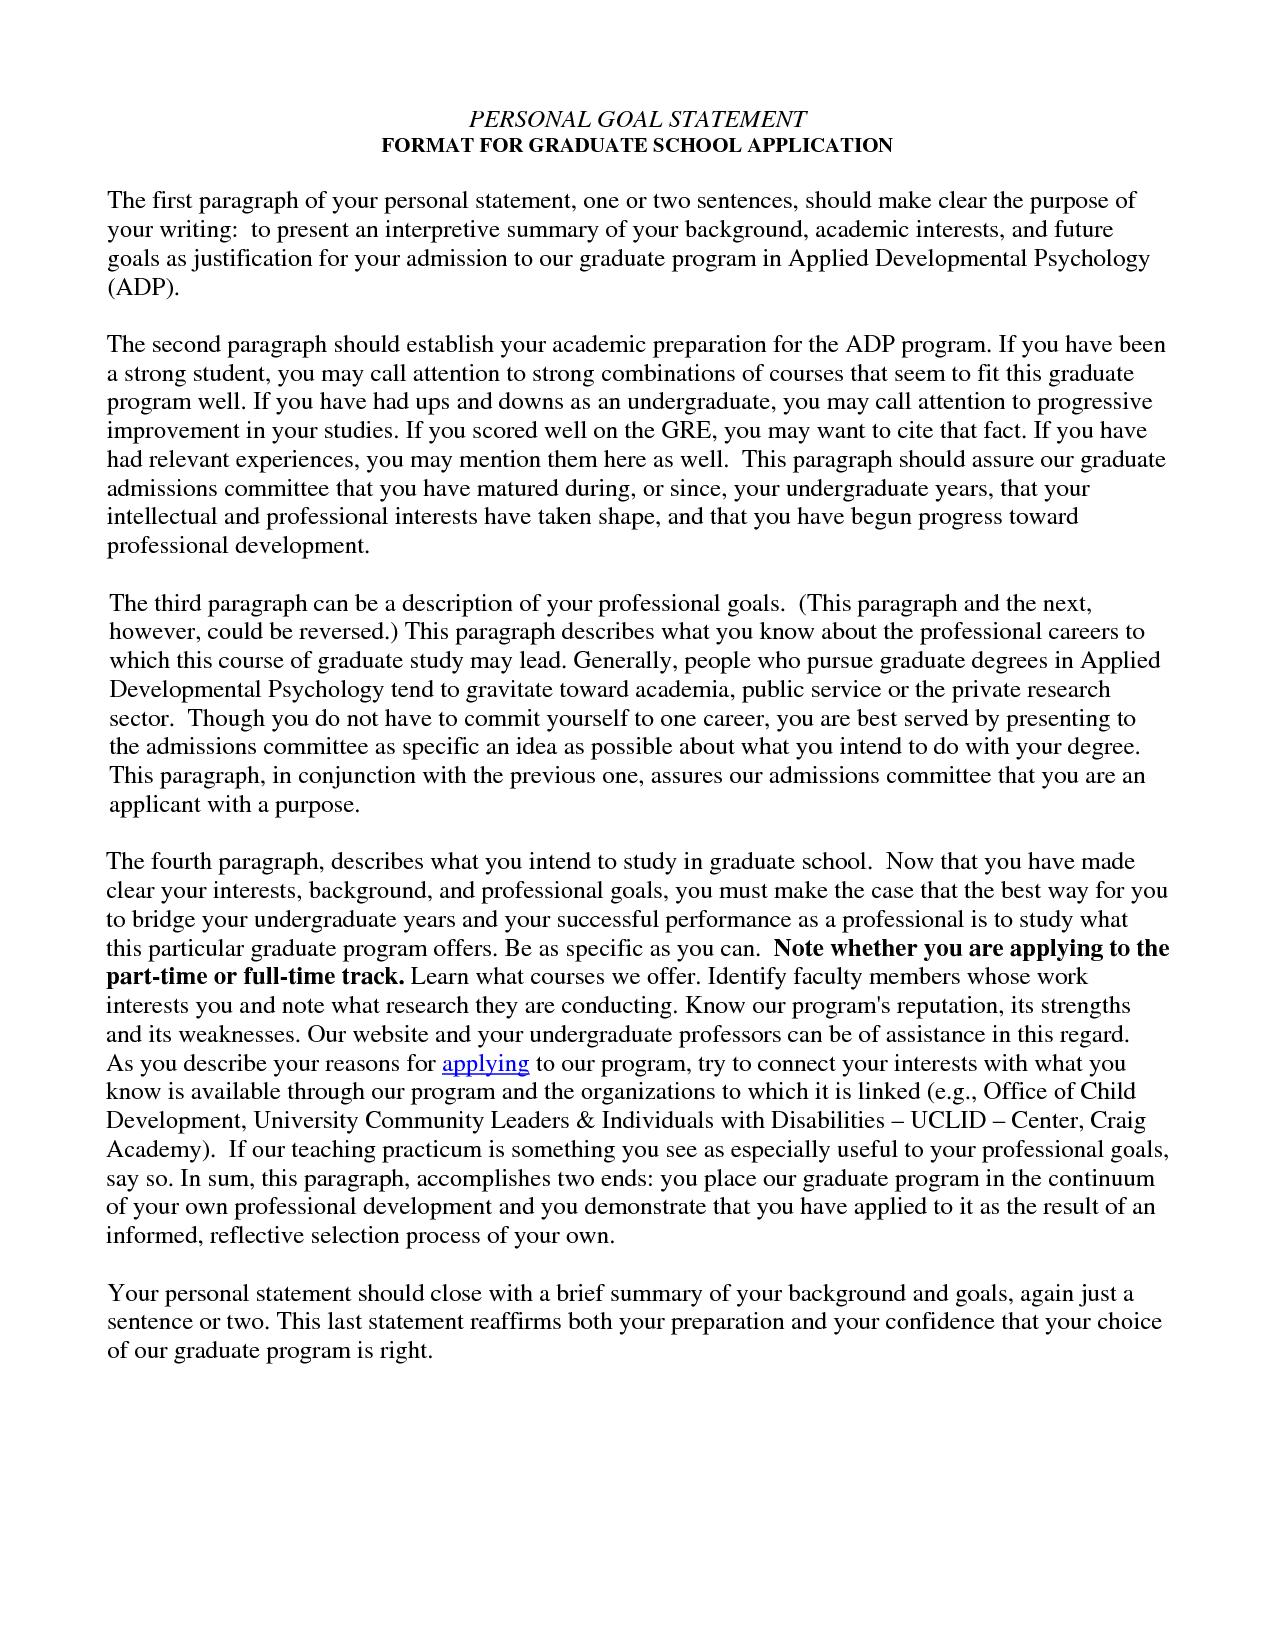 012 Essay Example Statement Of Purpose Graduate School Sample Essays Top Examples Mba Nursing Full